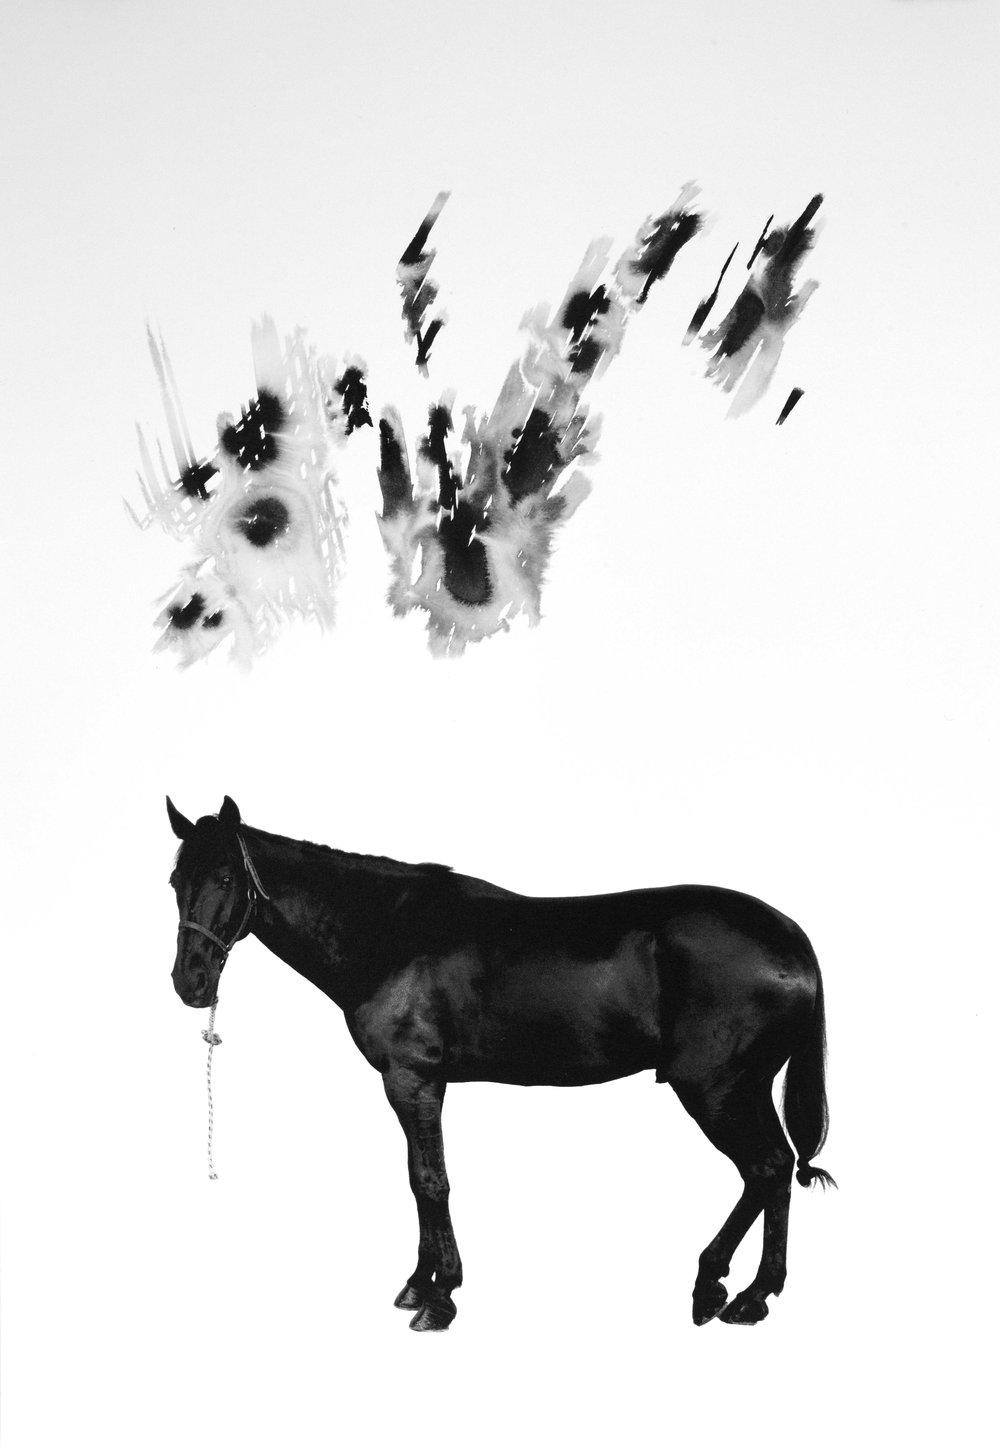 Noir 12 (Sold)